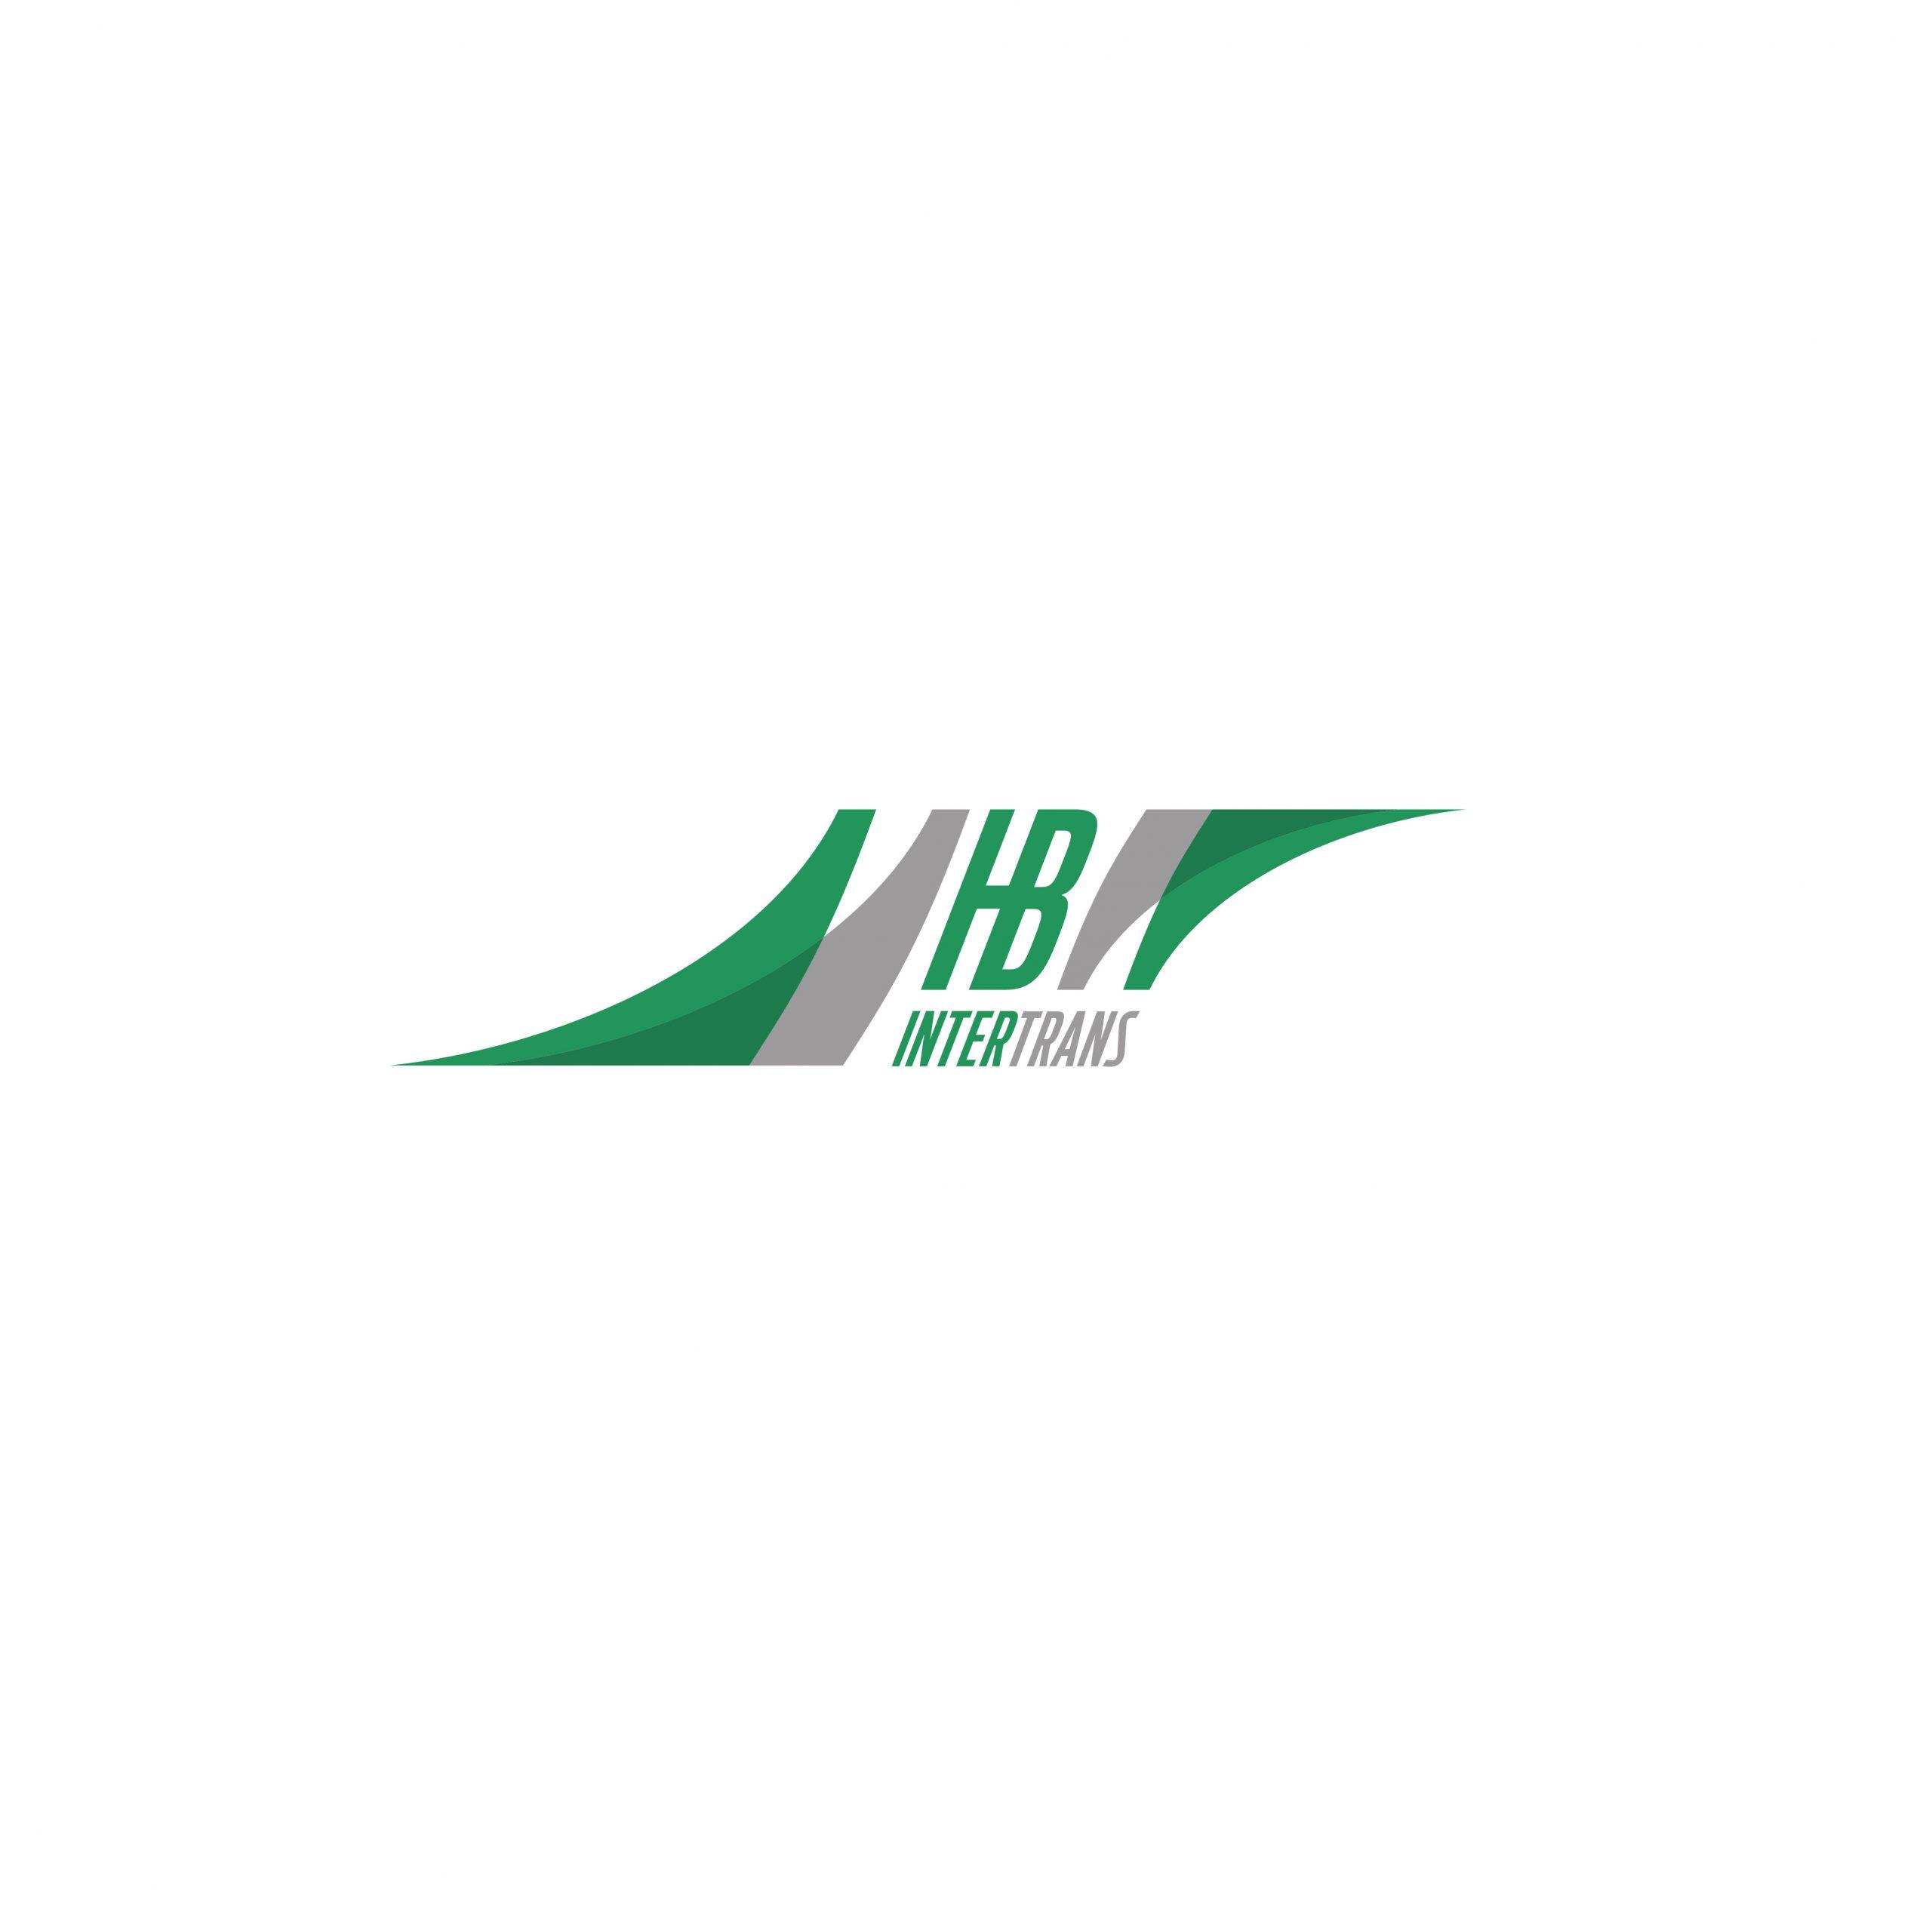 HB Intertrans logo_ok